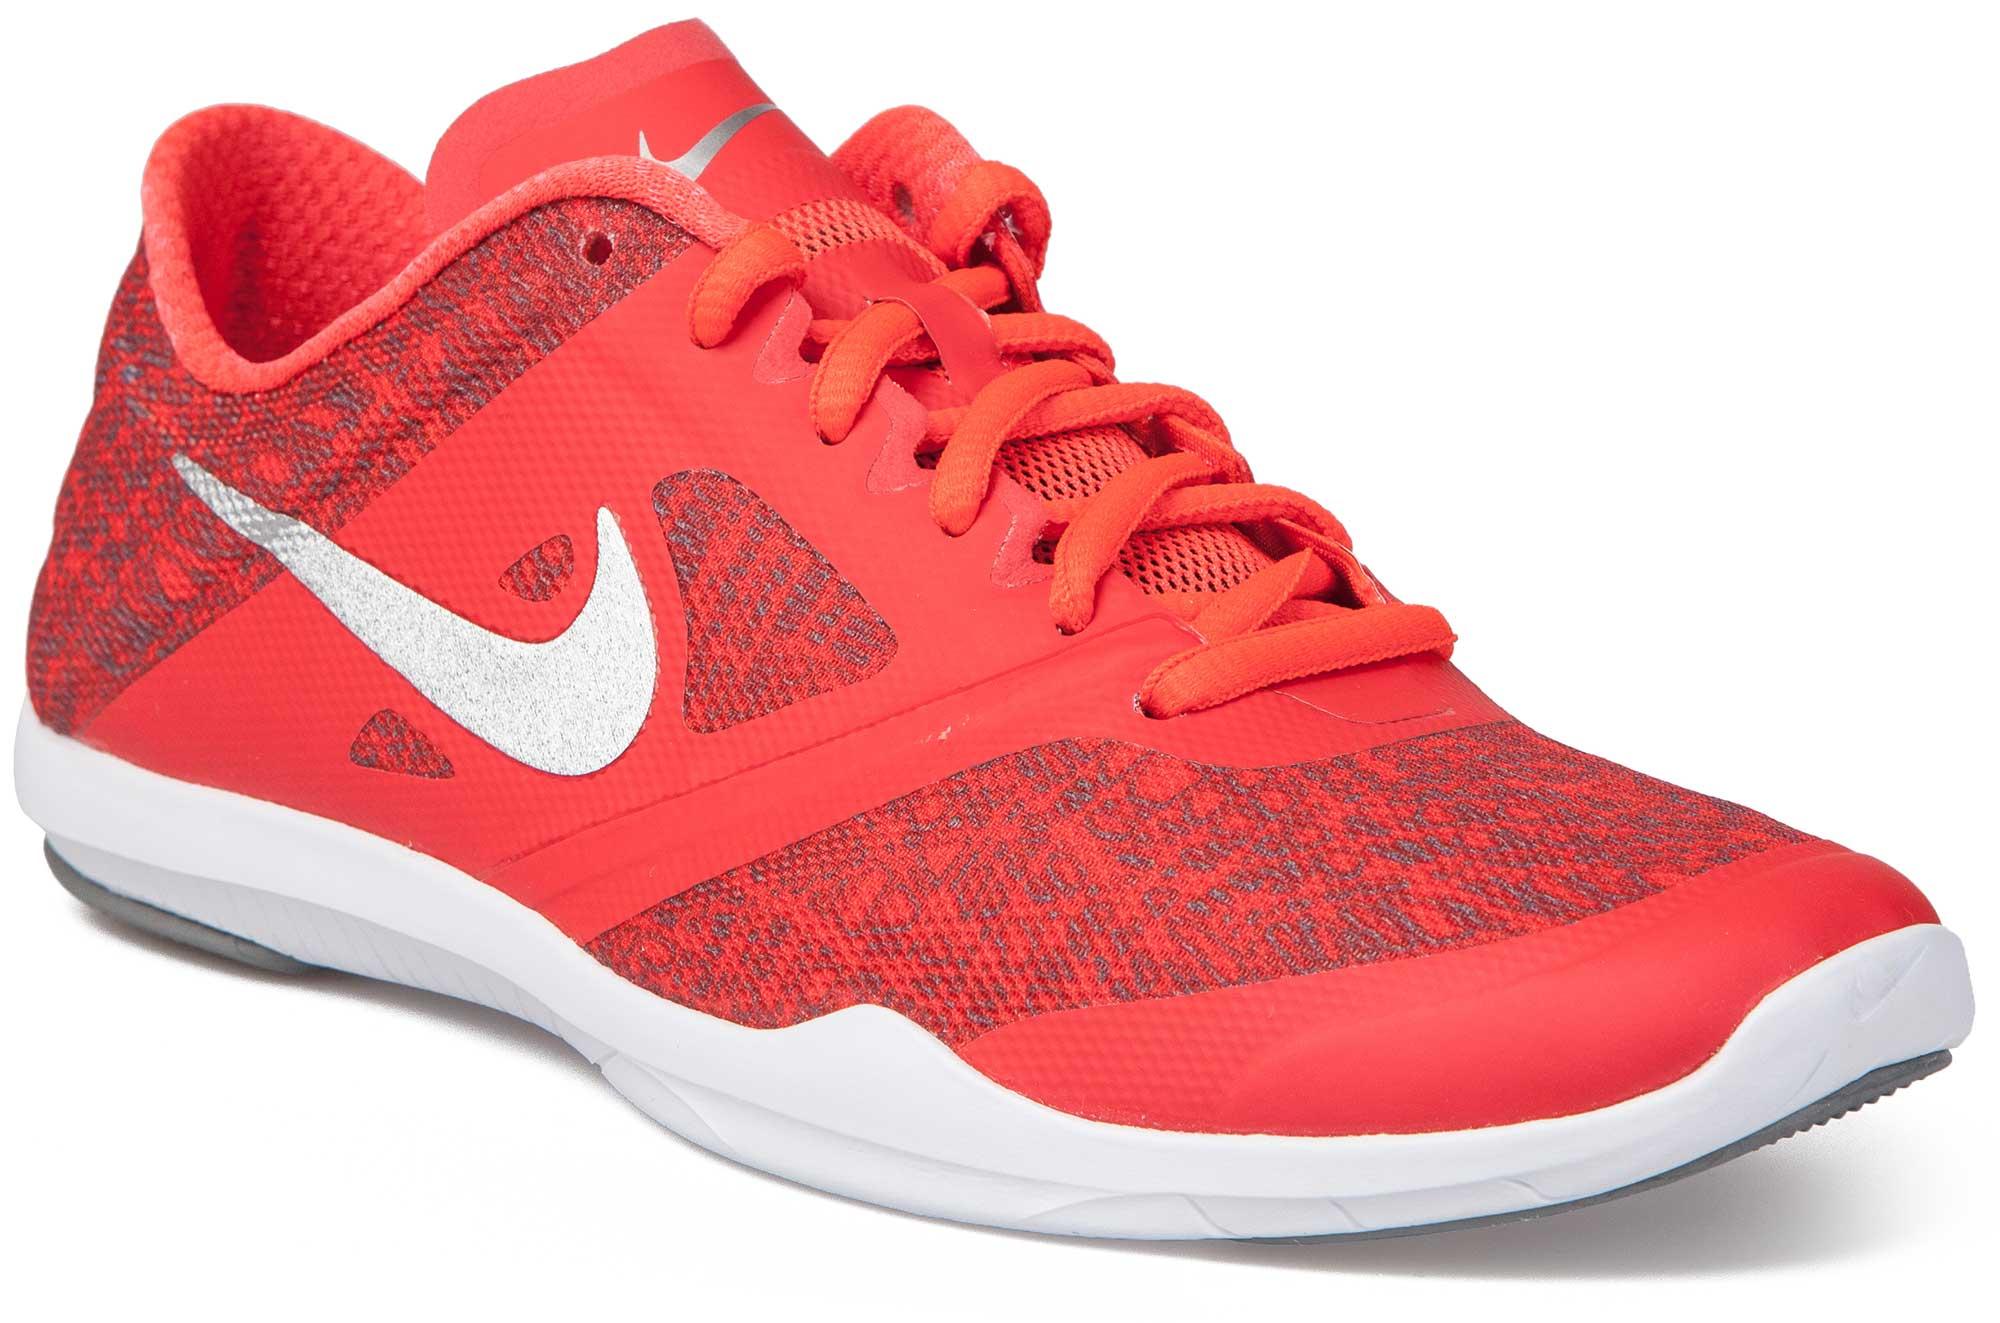 9f3a136c37aa0b Nike W STUDIO TRAINER 2 PRINT